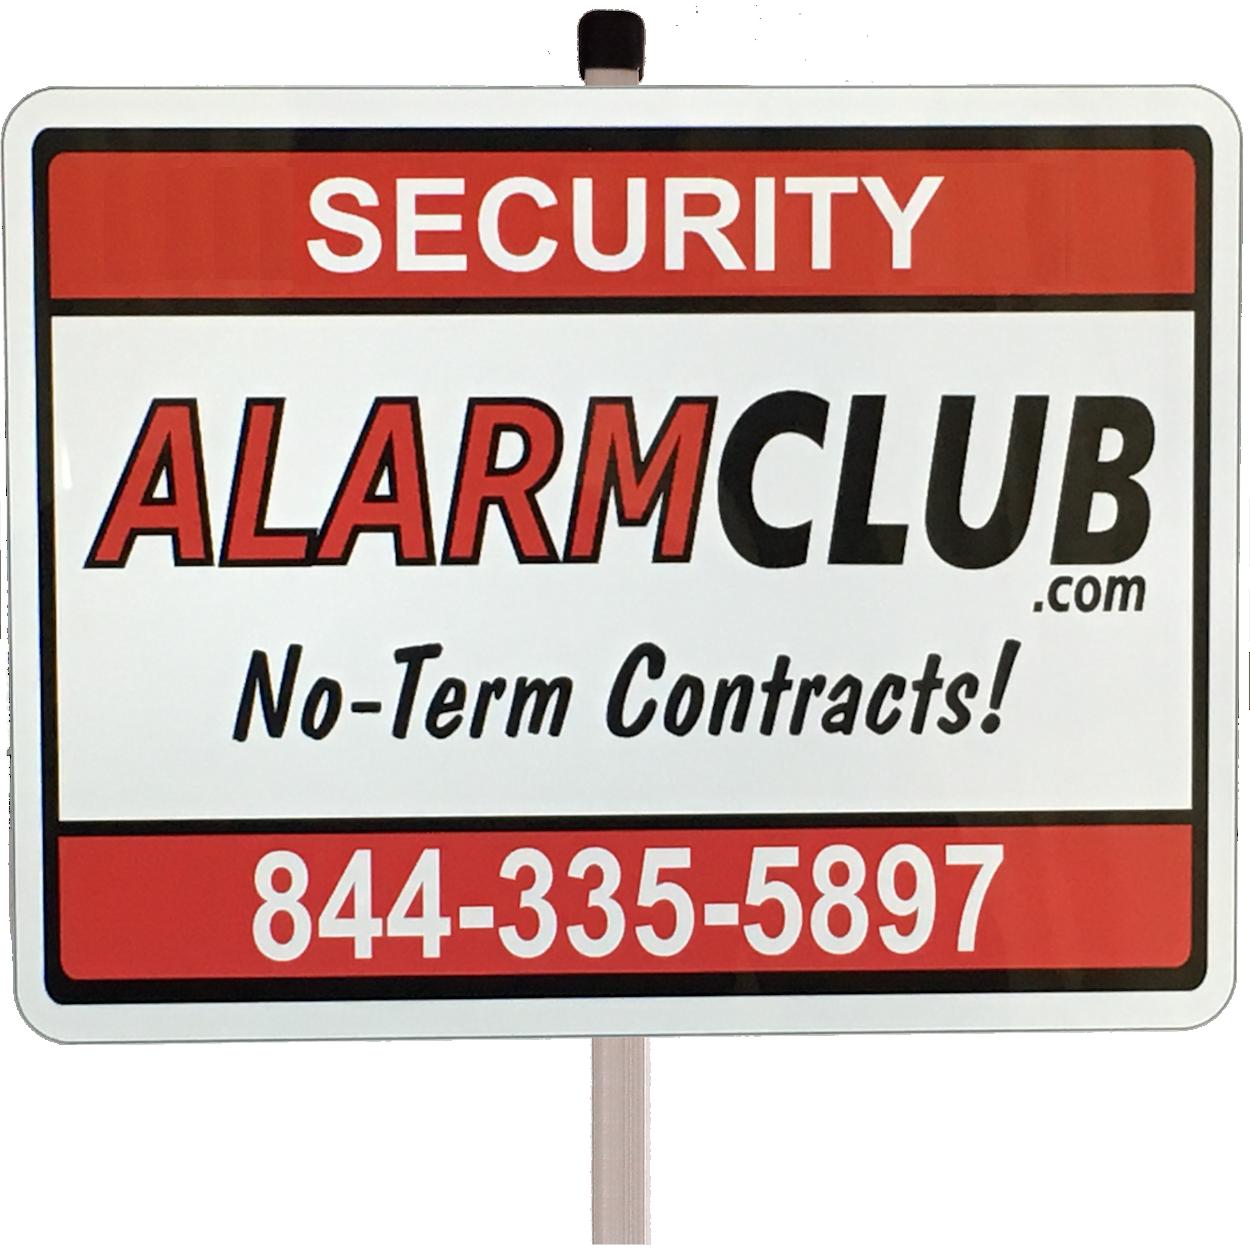 AlarmClub Security